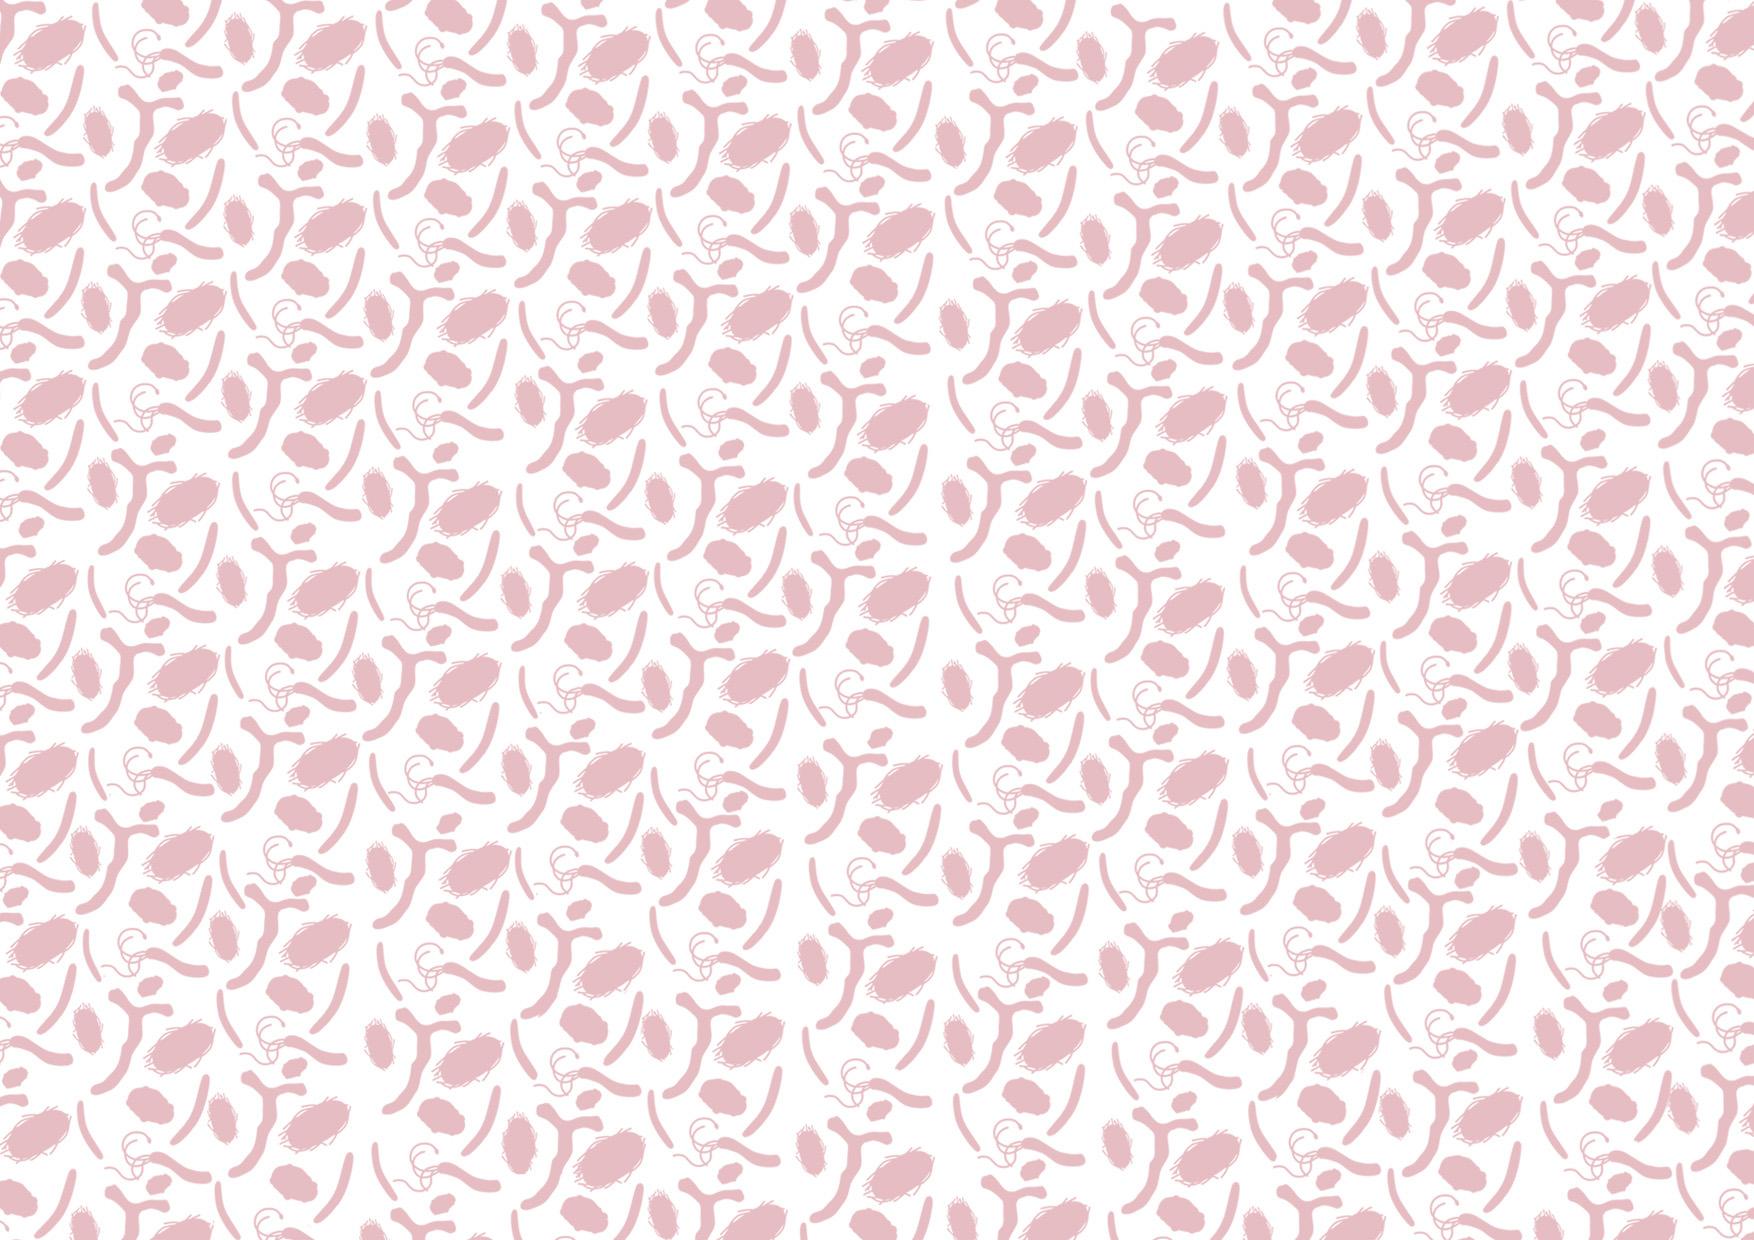 WG_wallpaper_1752x1240_aw_sm_red_30.jpg